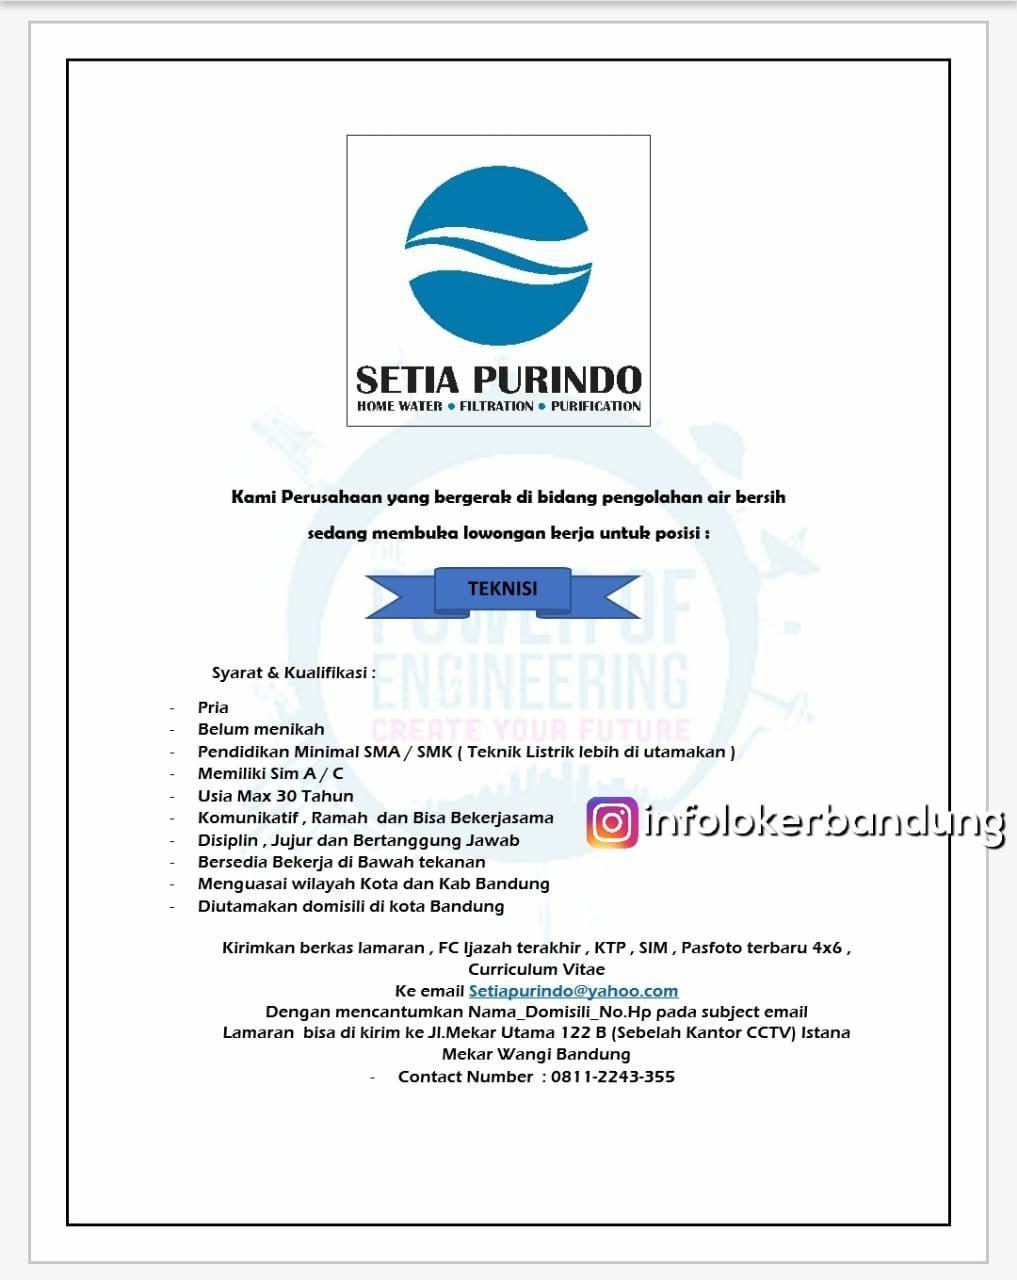 Lowongan Kerja Teknisi PT. Setia Purindo Bandung Juli 2018